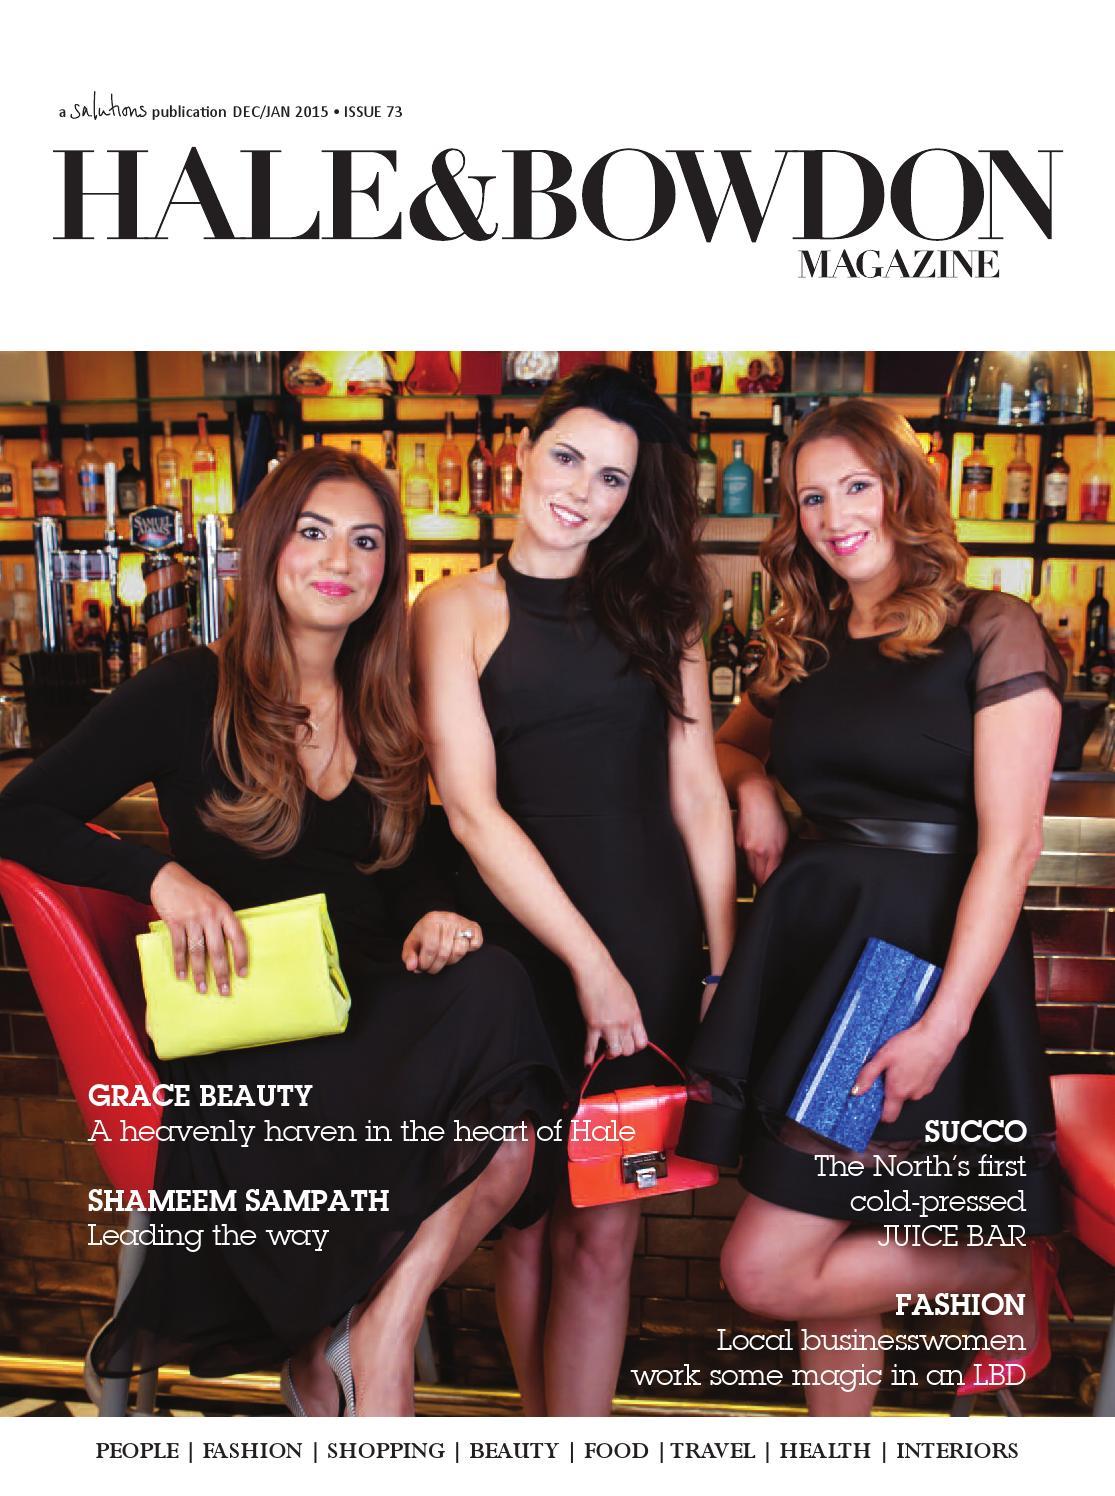 Halebowdon Magazine Dec Jan 2015 By Salutions Issuu Rock You Popeye G7 Strap Gitar Dan Bass